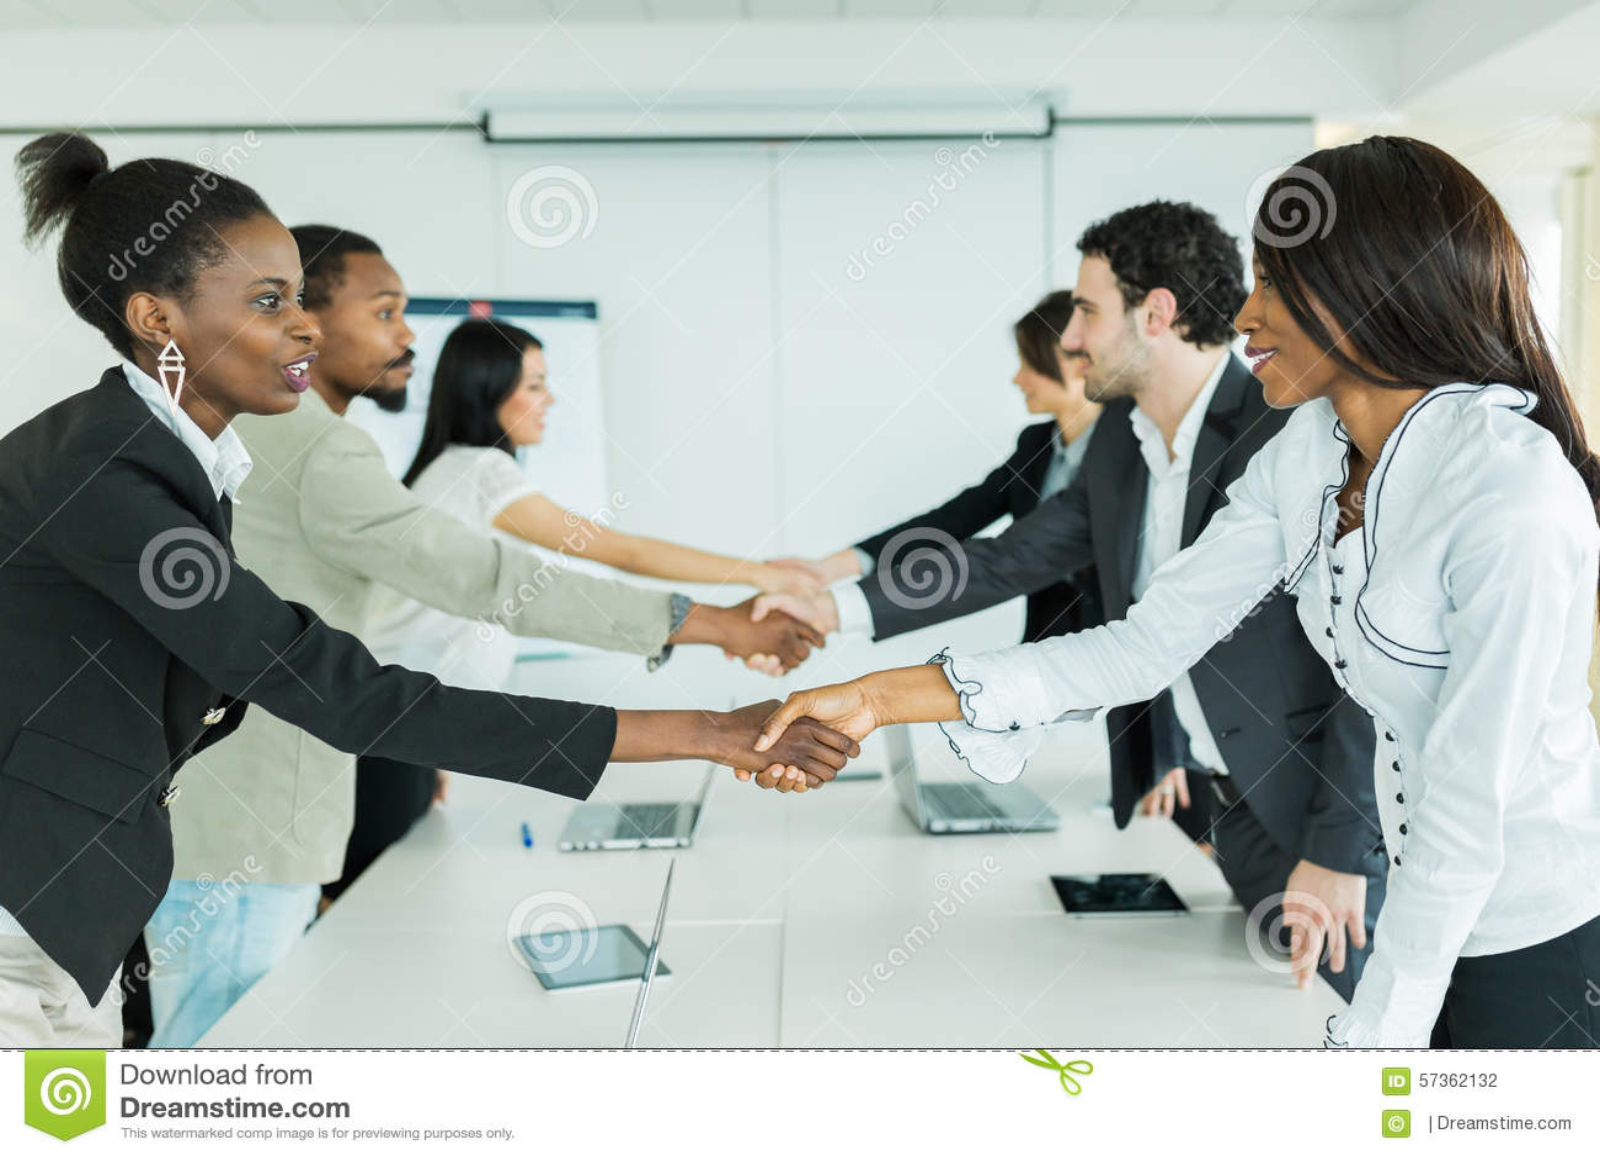 Business people handshake greeting deal at work photo free download - Business Greeting Hands People Handshake